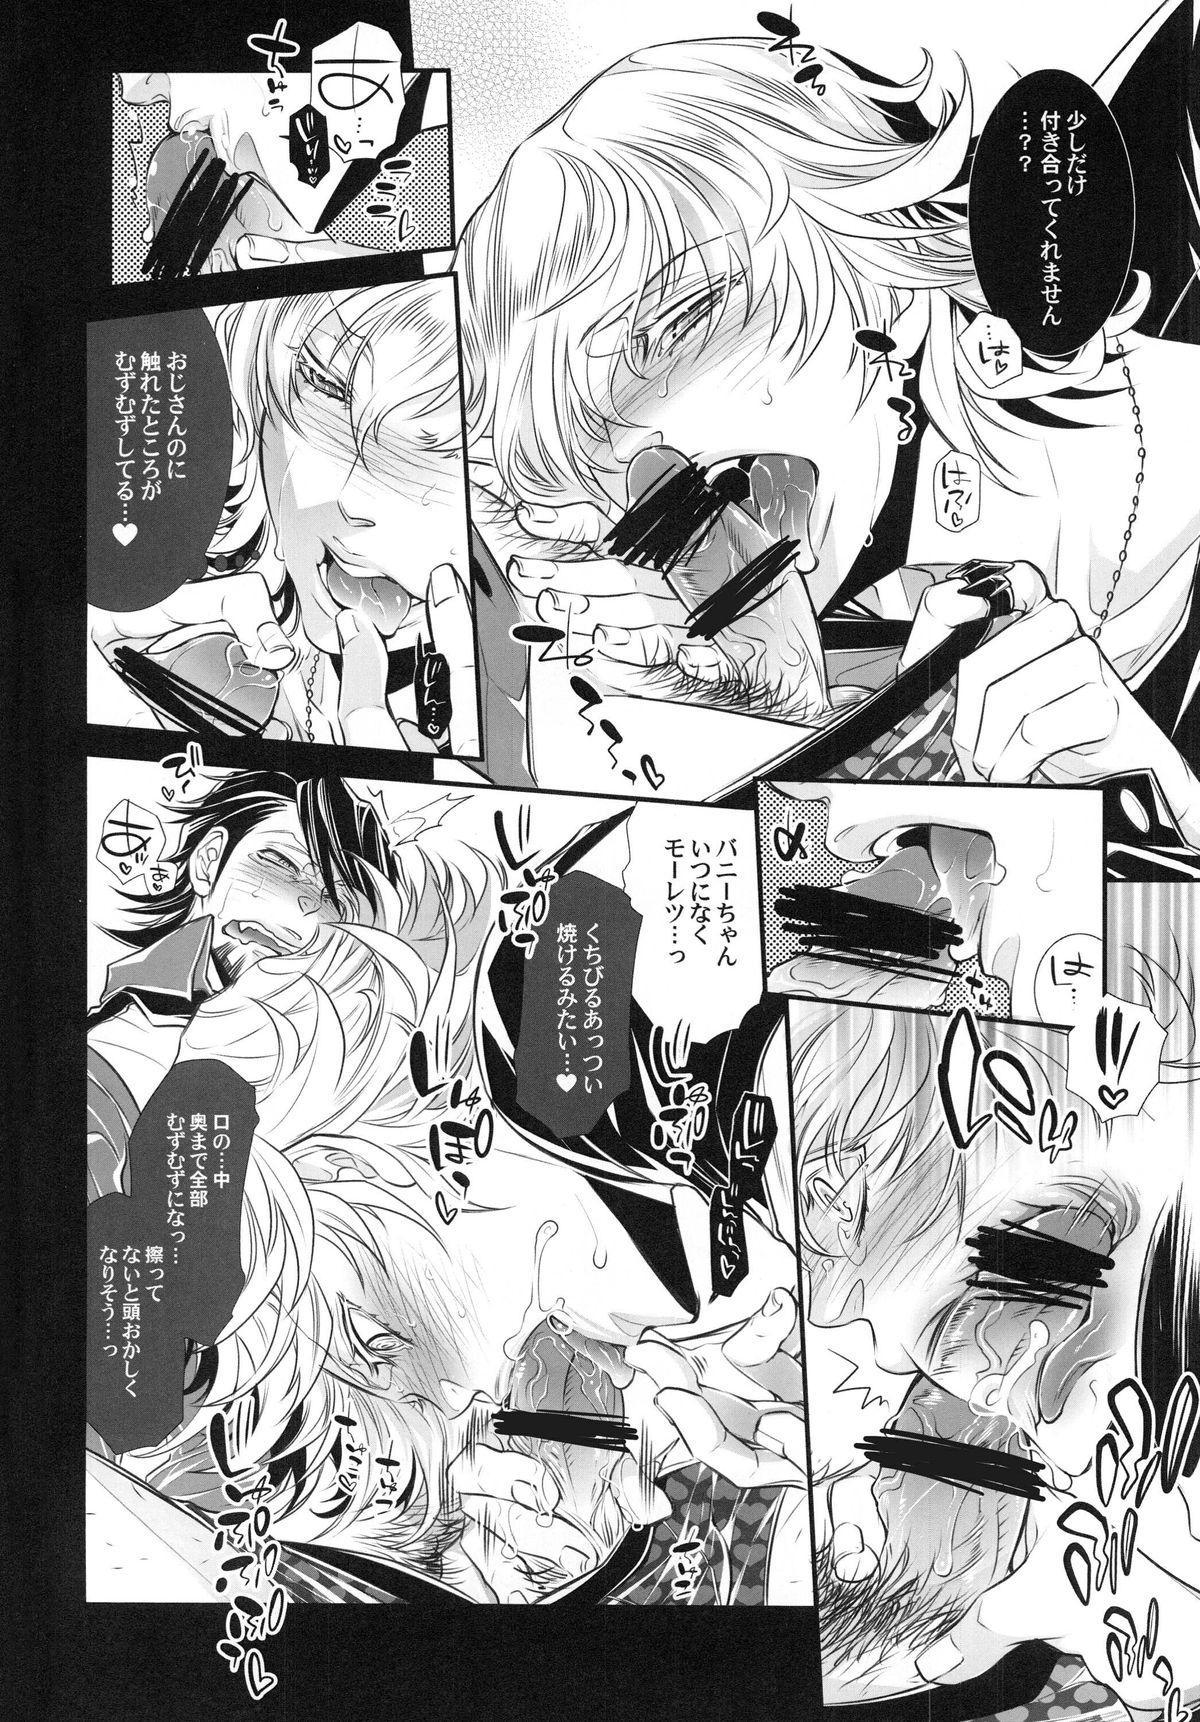 Bunny-chan to Iikoto Shiyokka 11